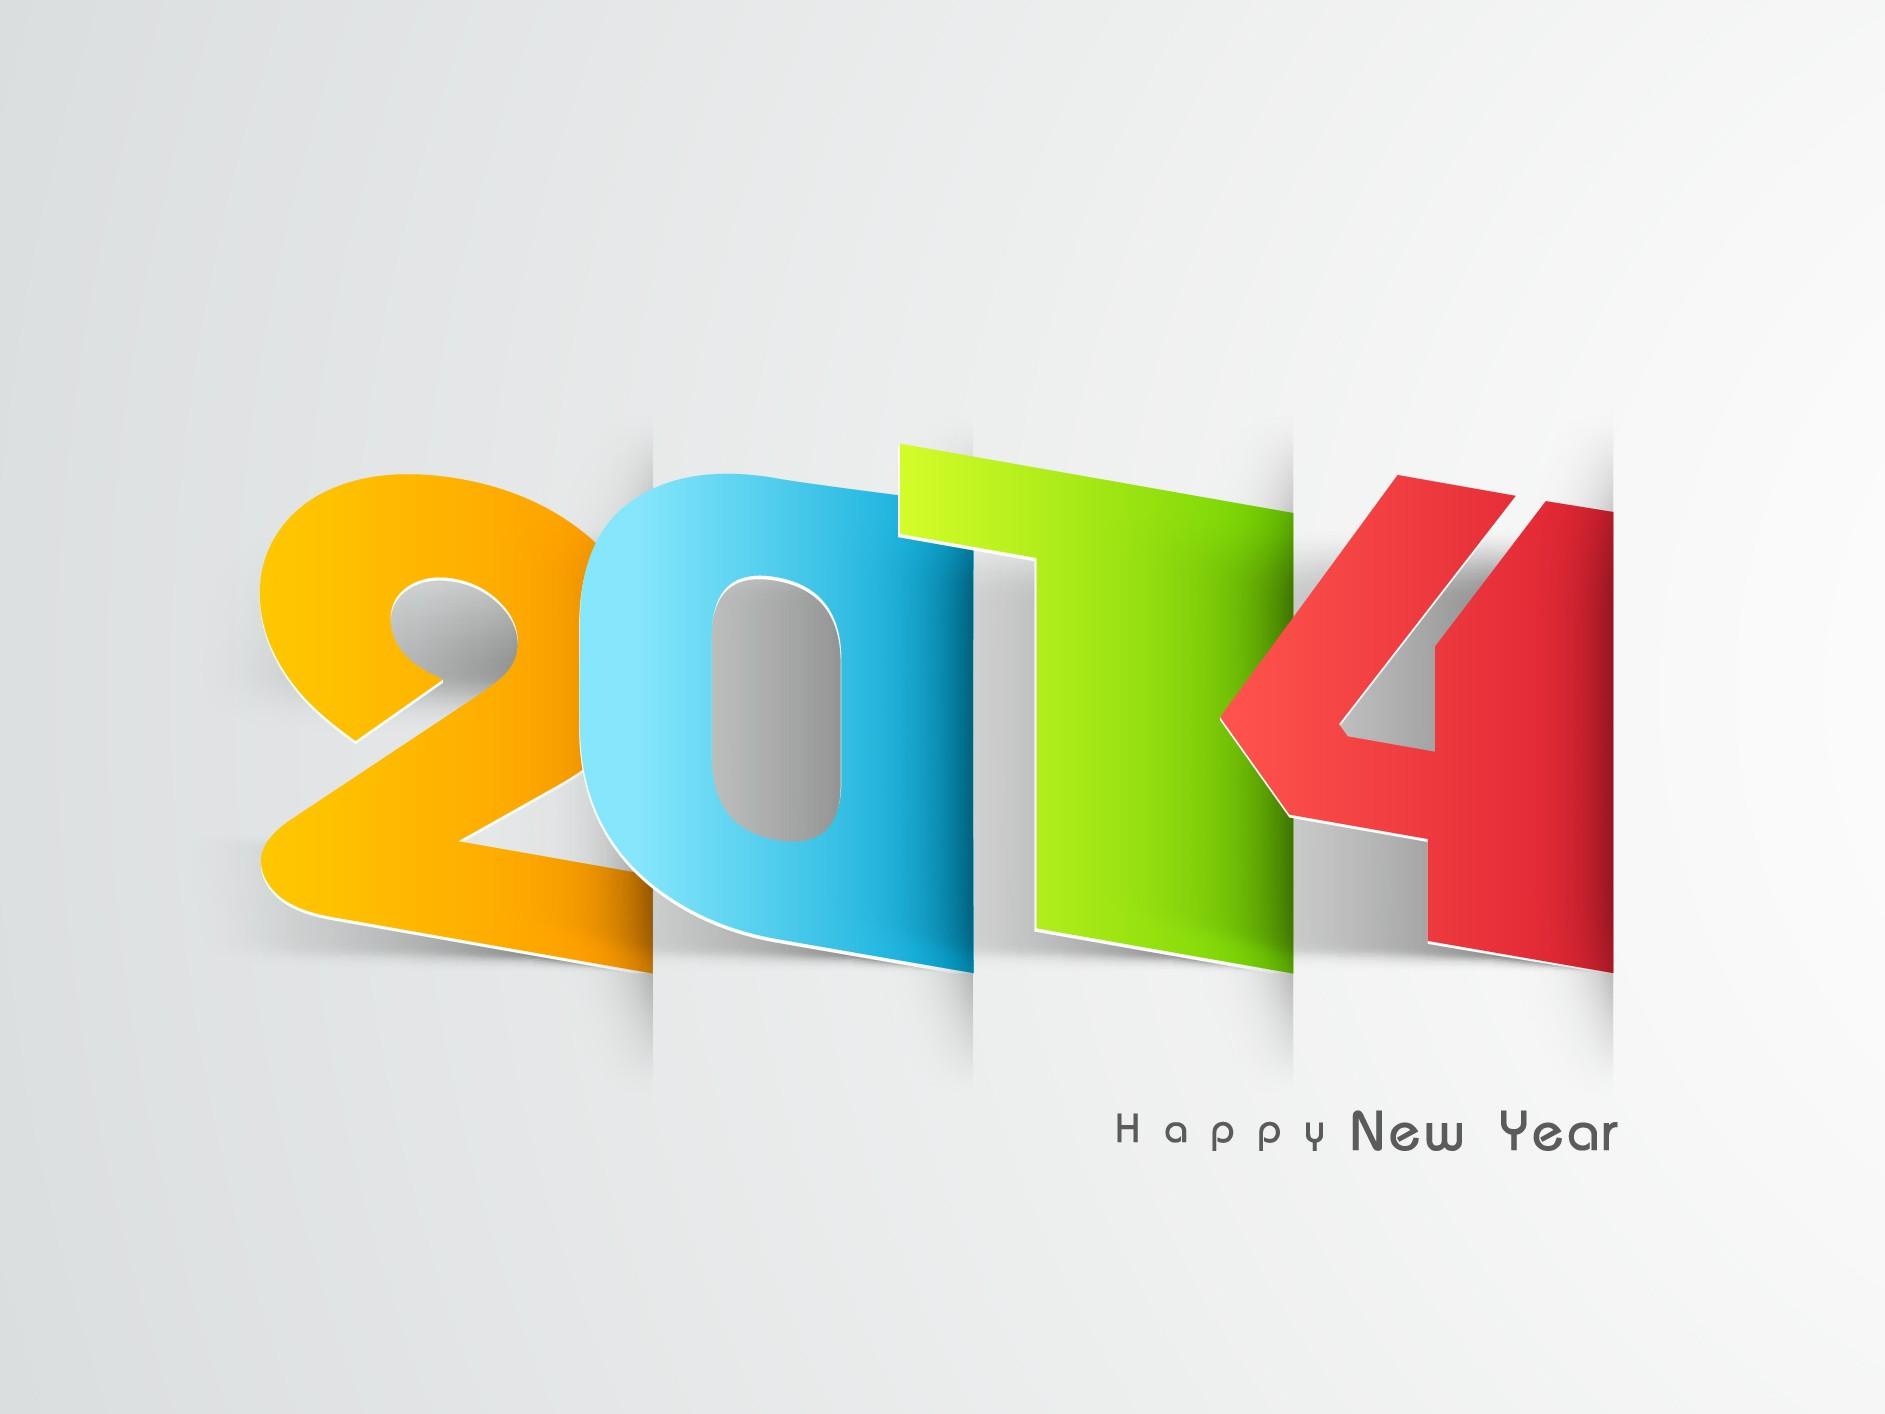 Happy-New-Year-2014.jpg